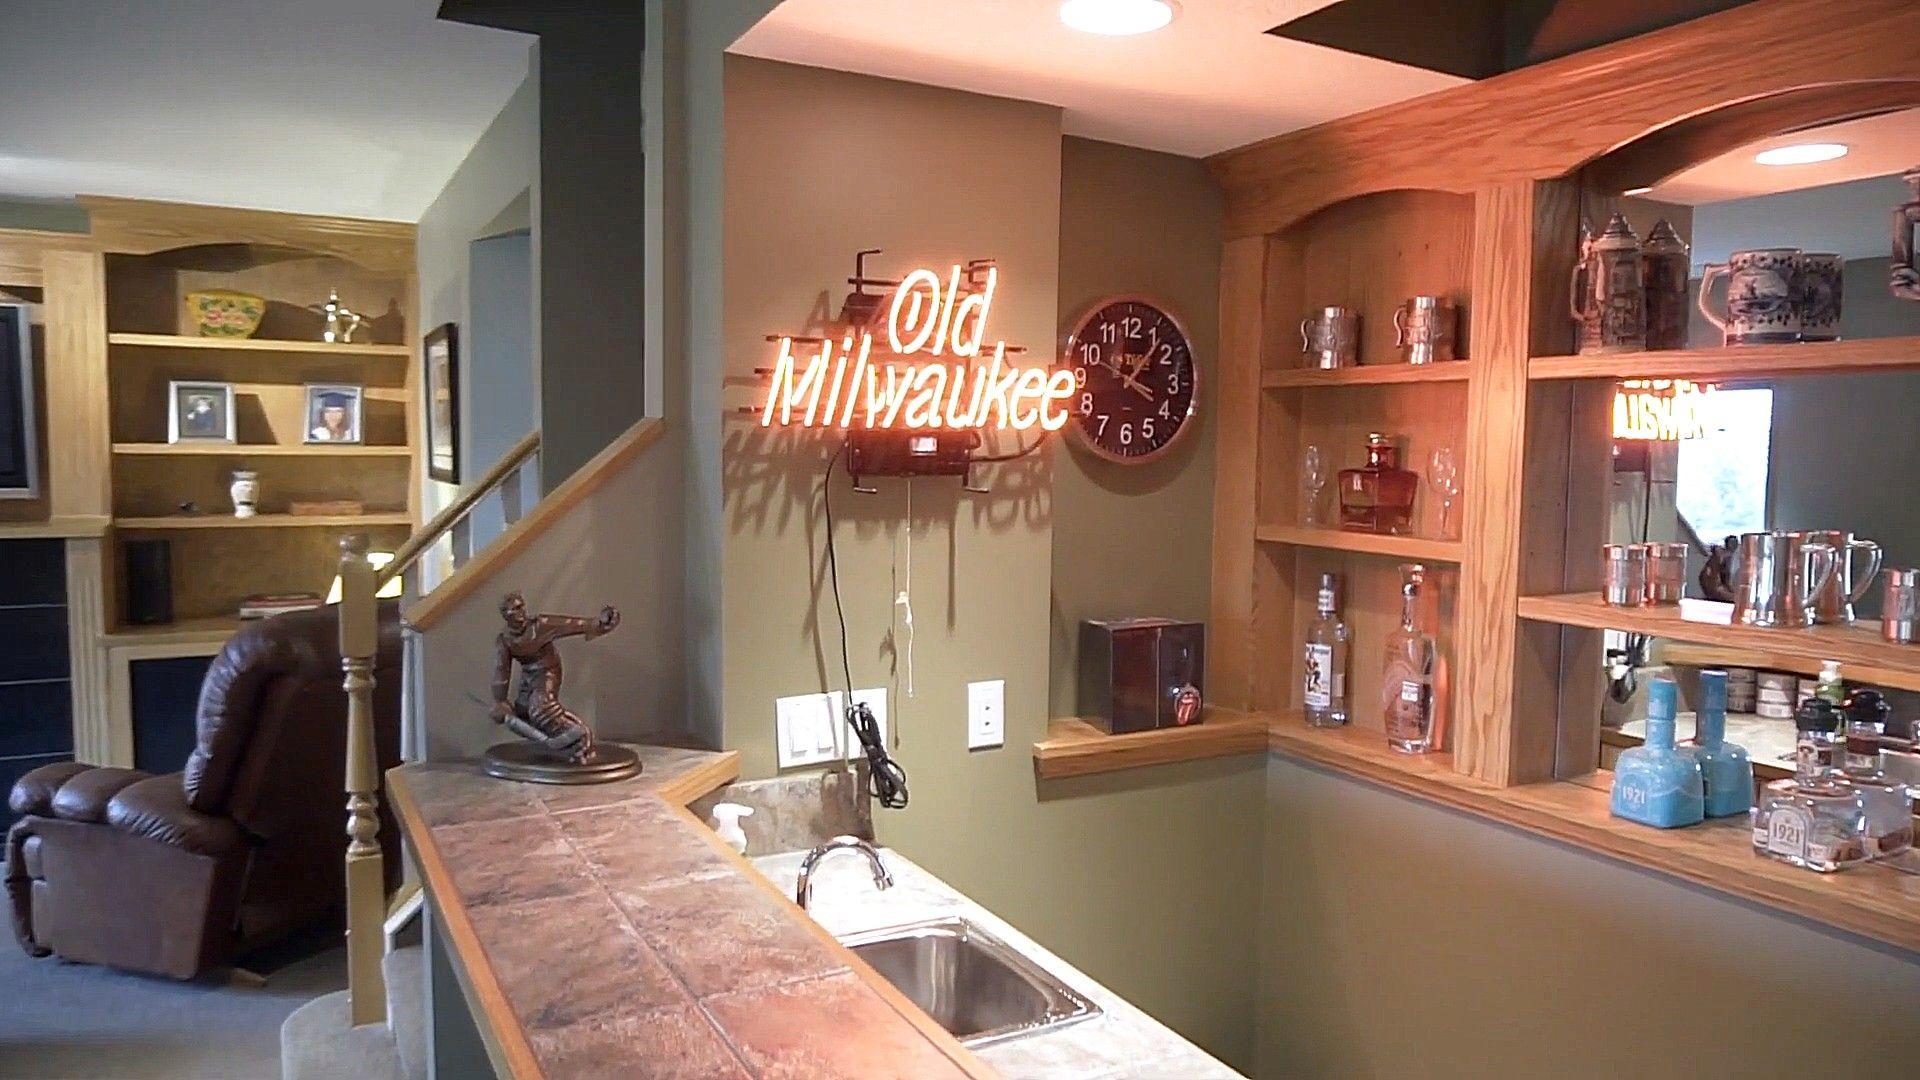 Words Led Lights Decor On A Kitchen Bar Concept   Kitchen bar ...